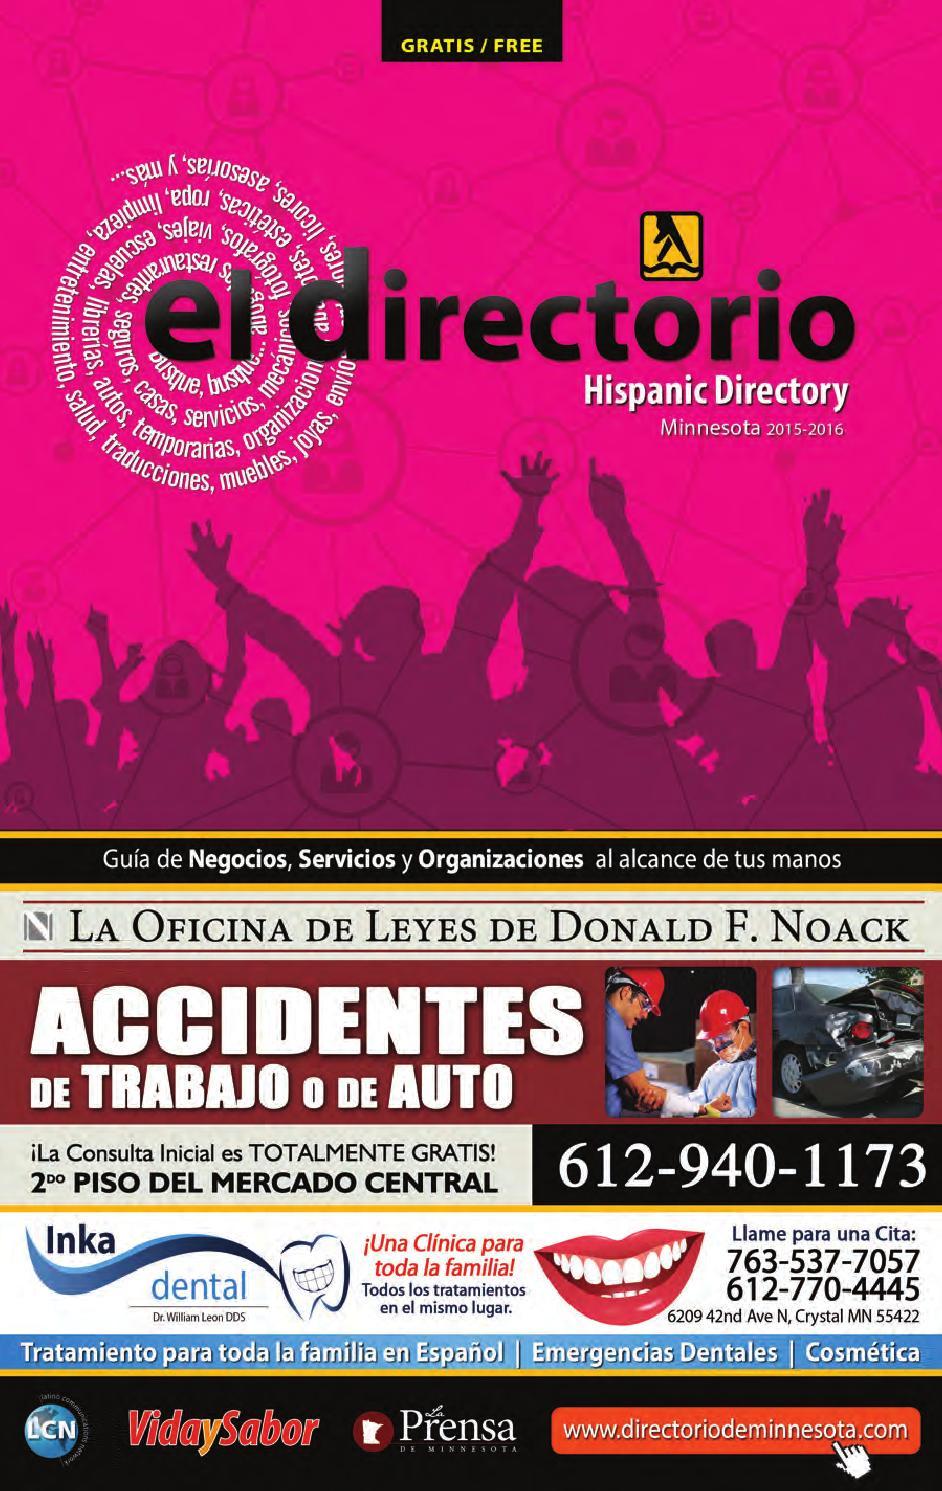 El Directorio 2015 2016 by Latino Communications Network LLC - issuu